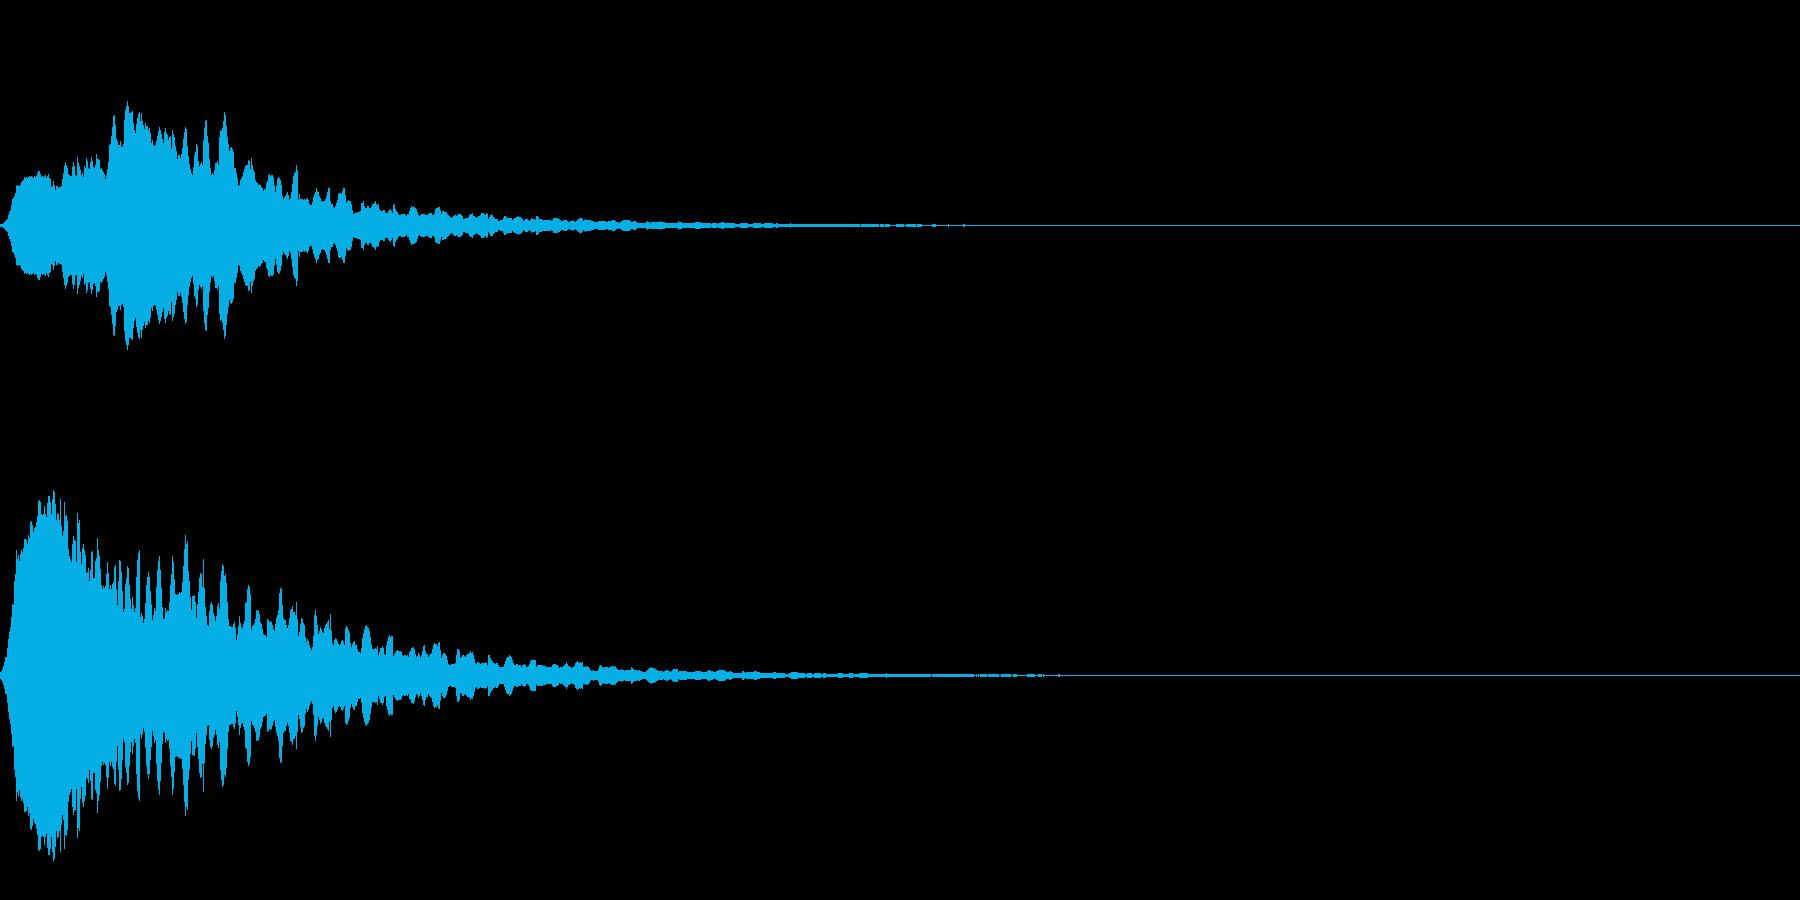 Anime アニメ向けマジカルエフェクトの再生済みの波形